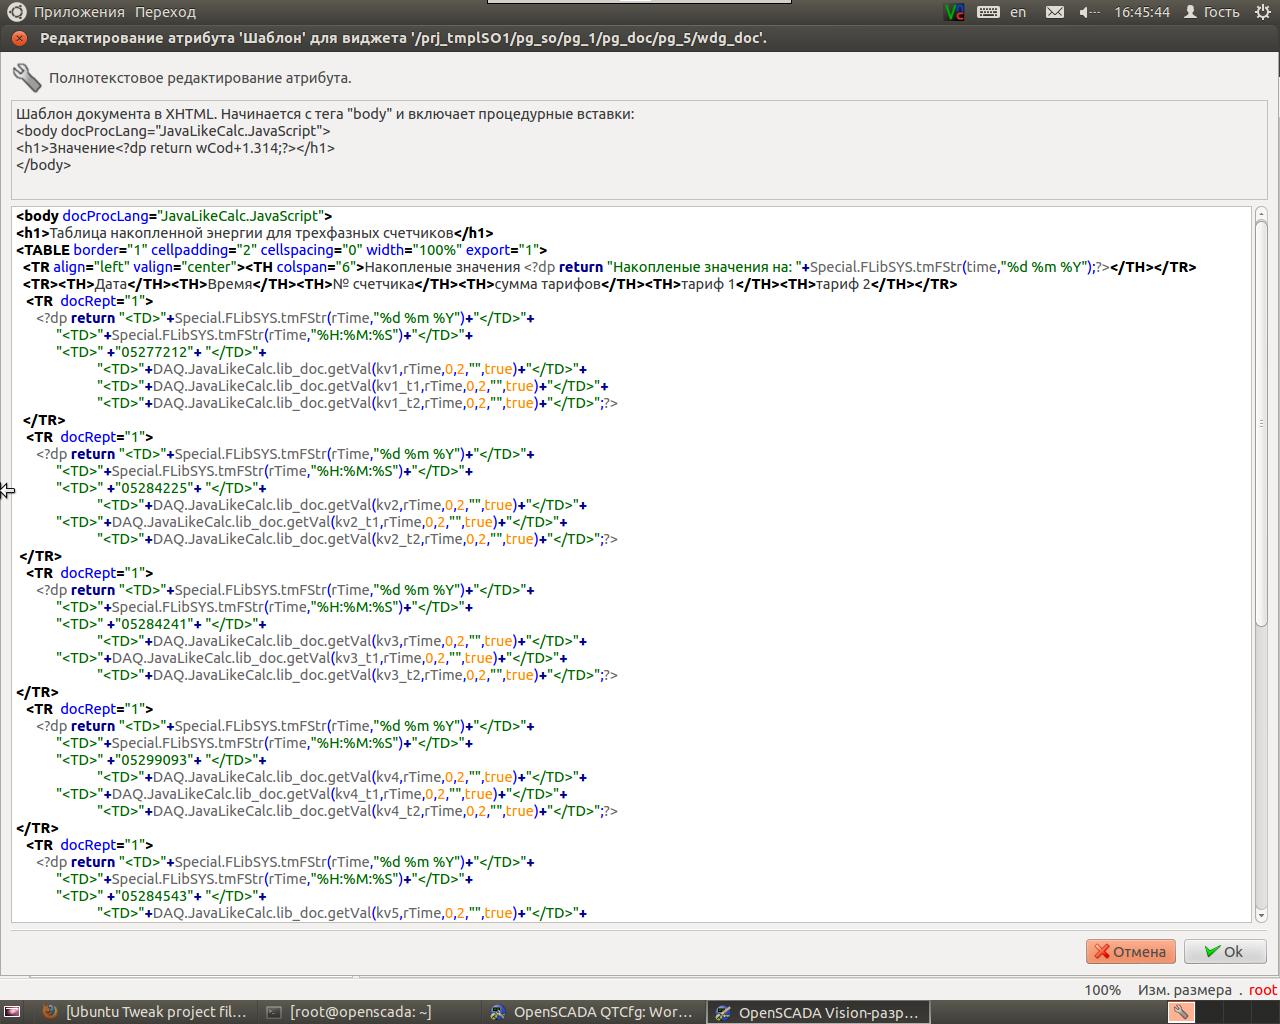 Пишем протоколы счетчиков Меркурий 230 и Меркурий 200 для OpenSCADA - 19